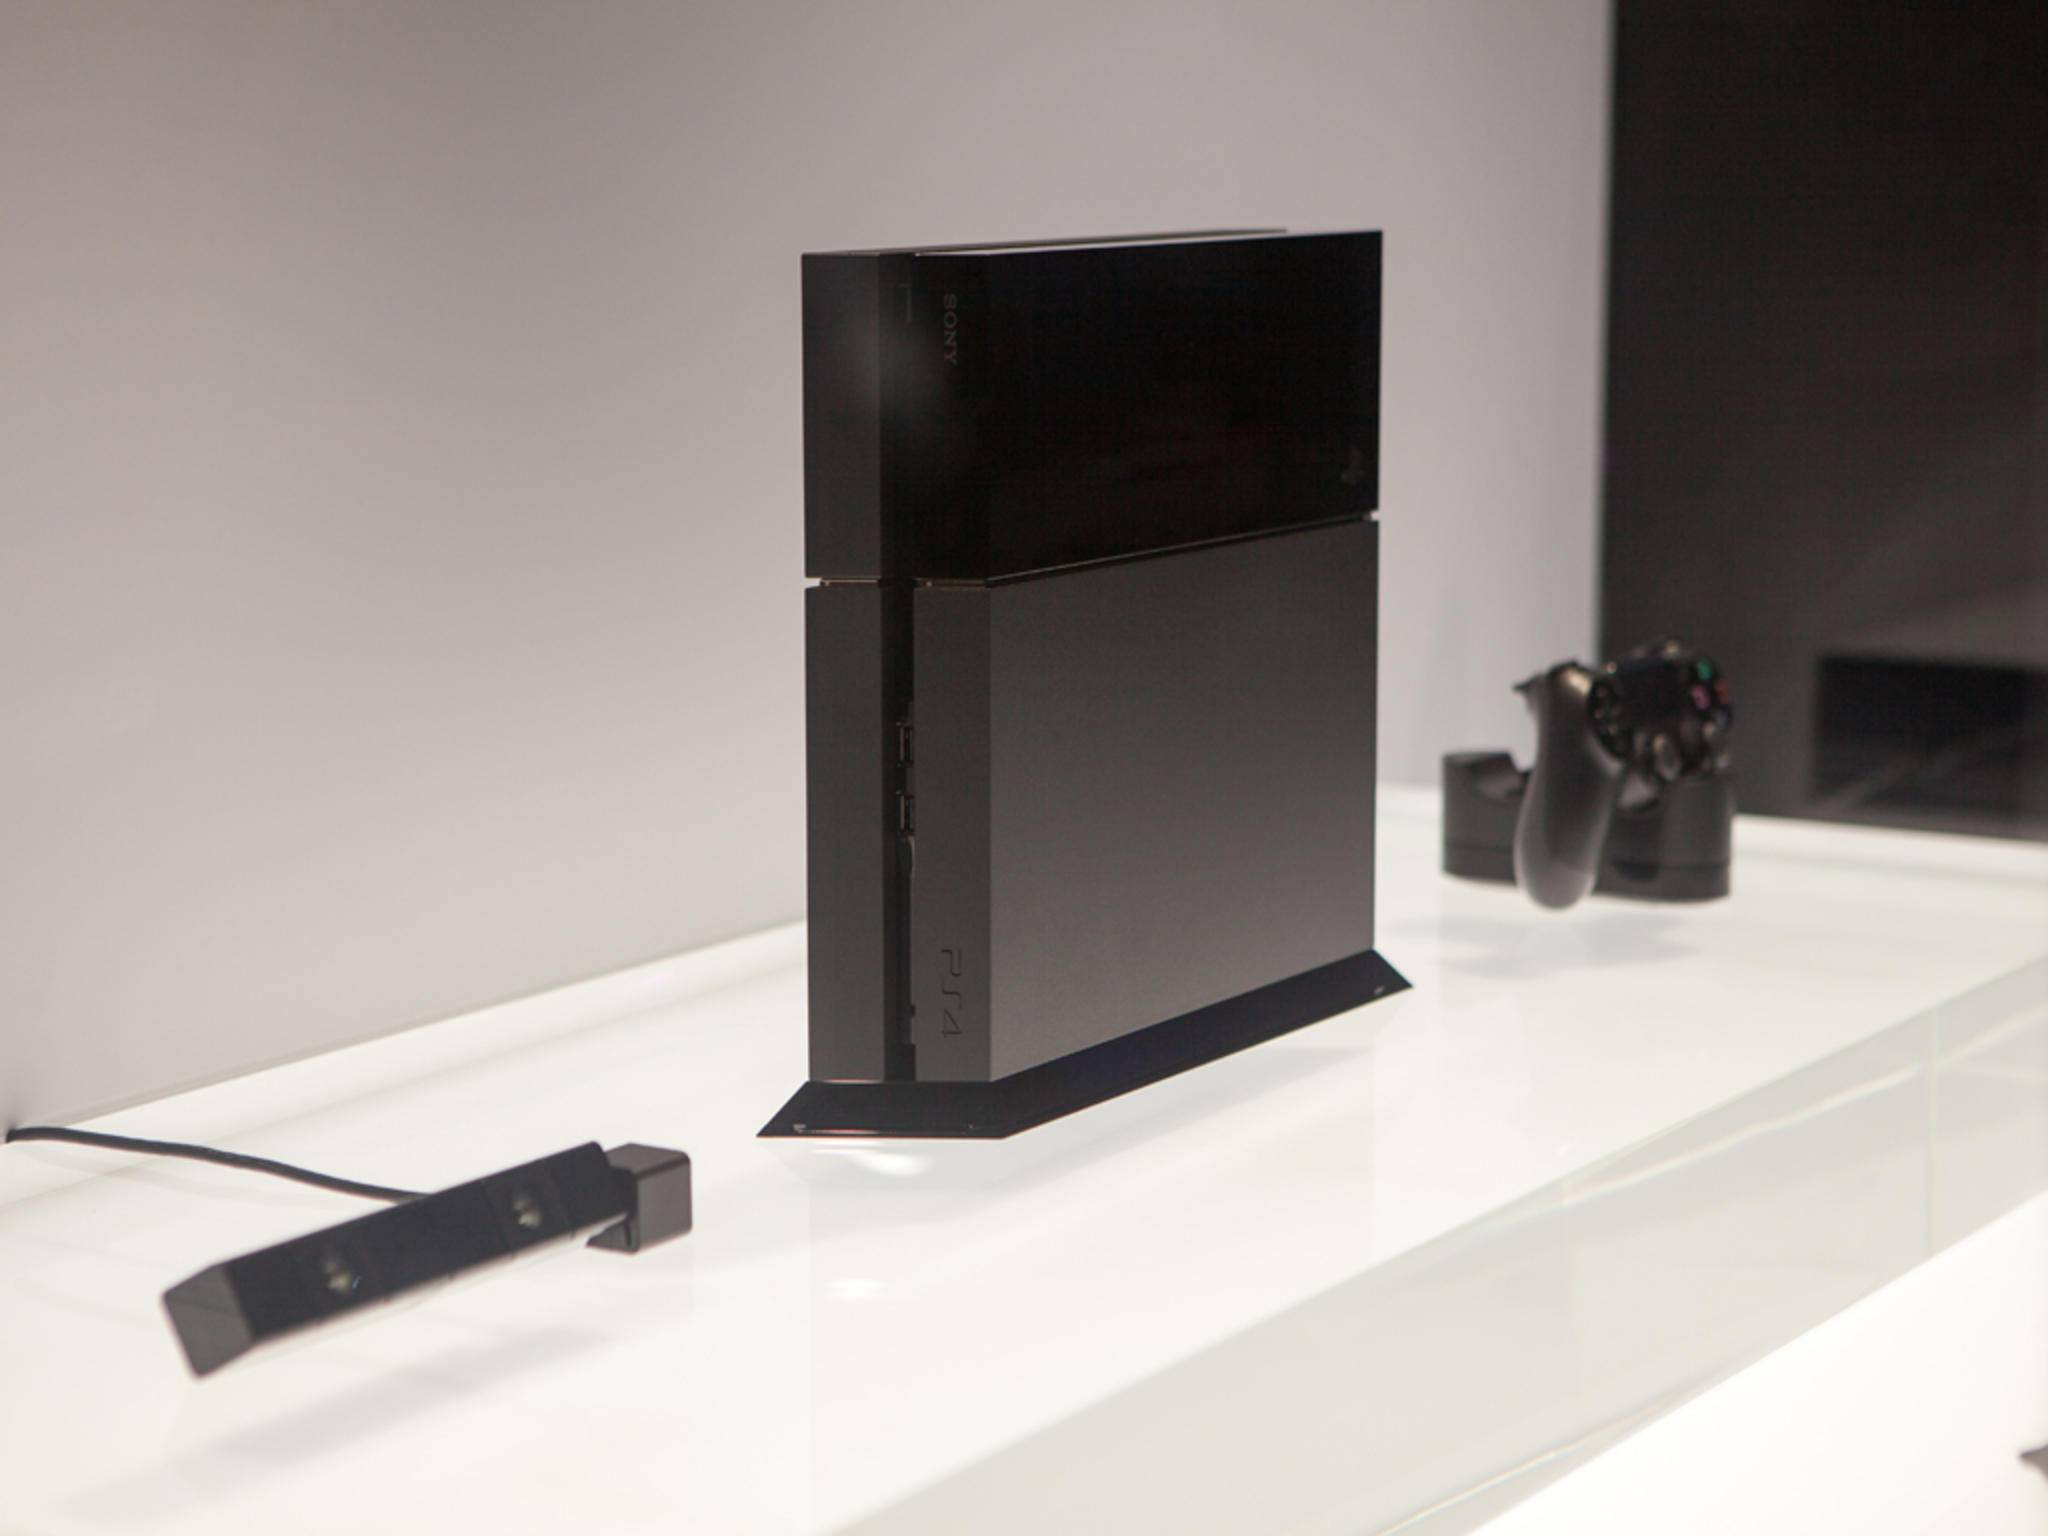 Die PlayStation 4 bekommt ein Software-Update verpasst.